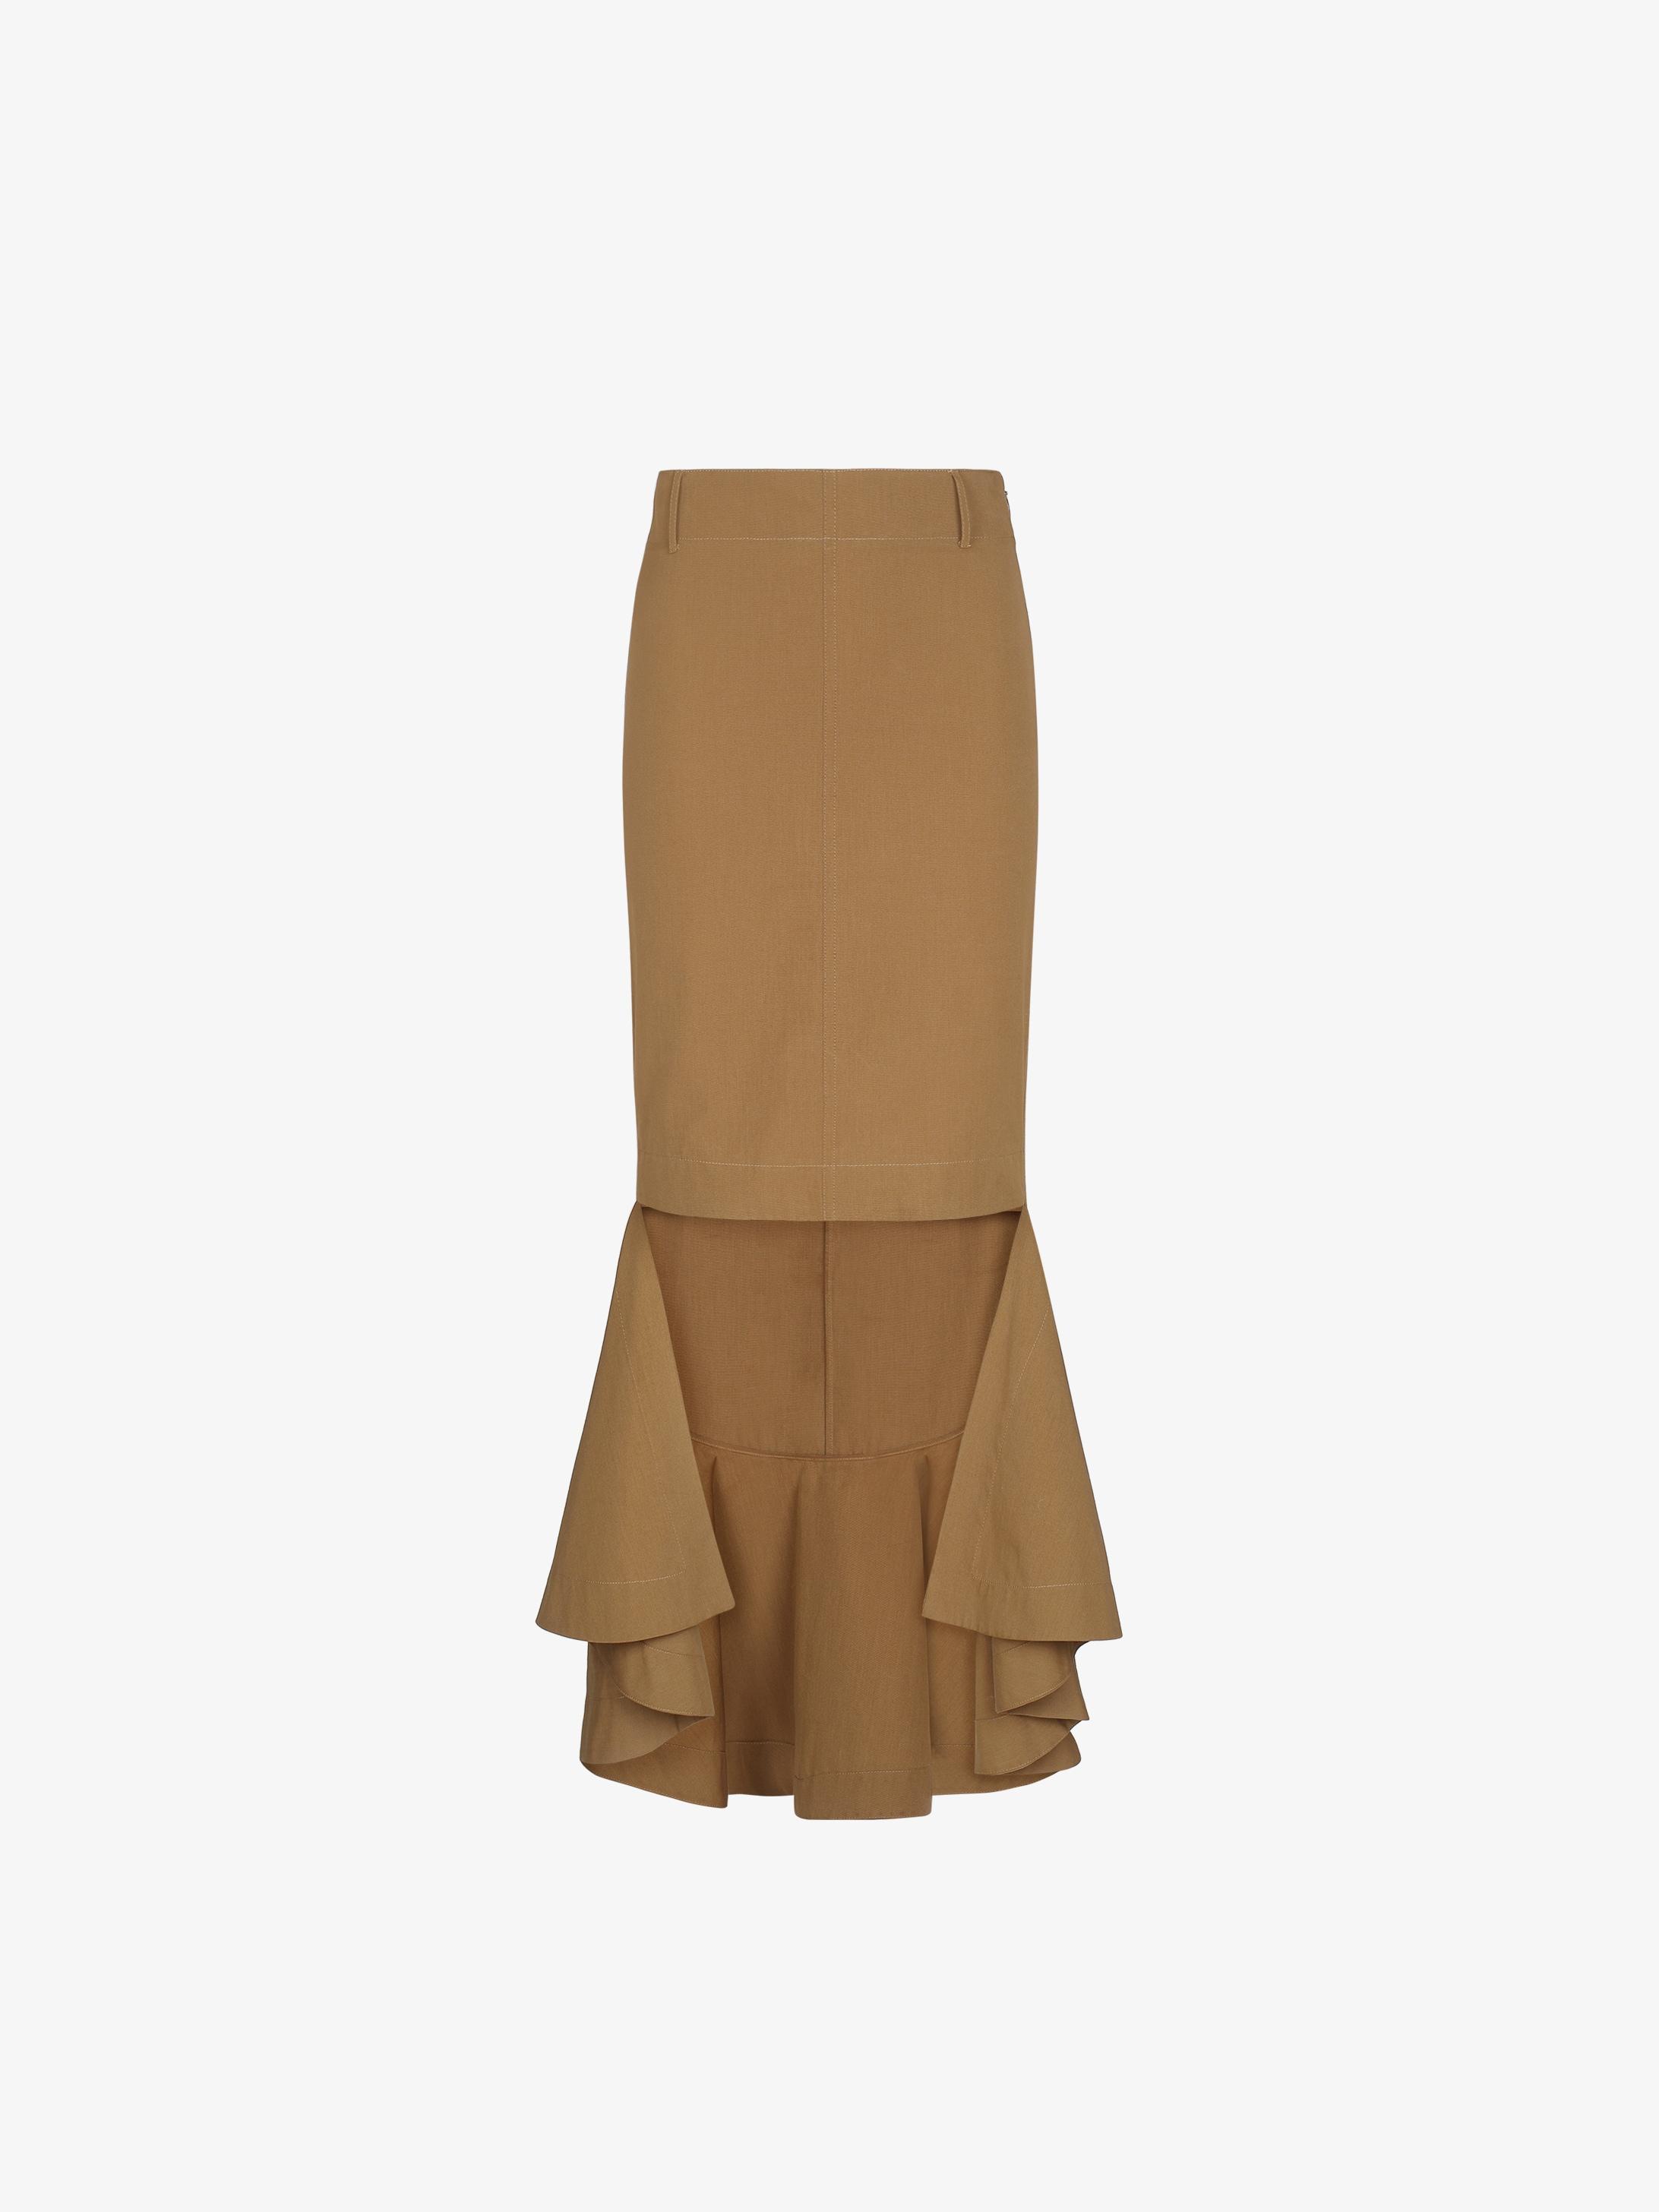 Asymmetrical skirt with ruffle